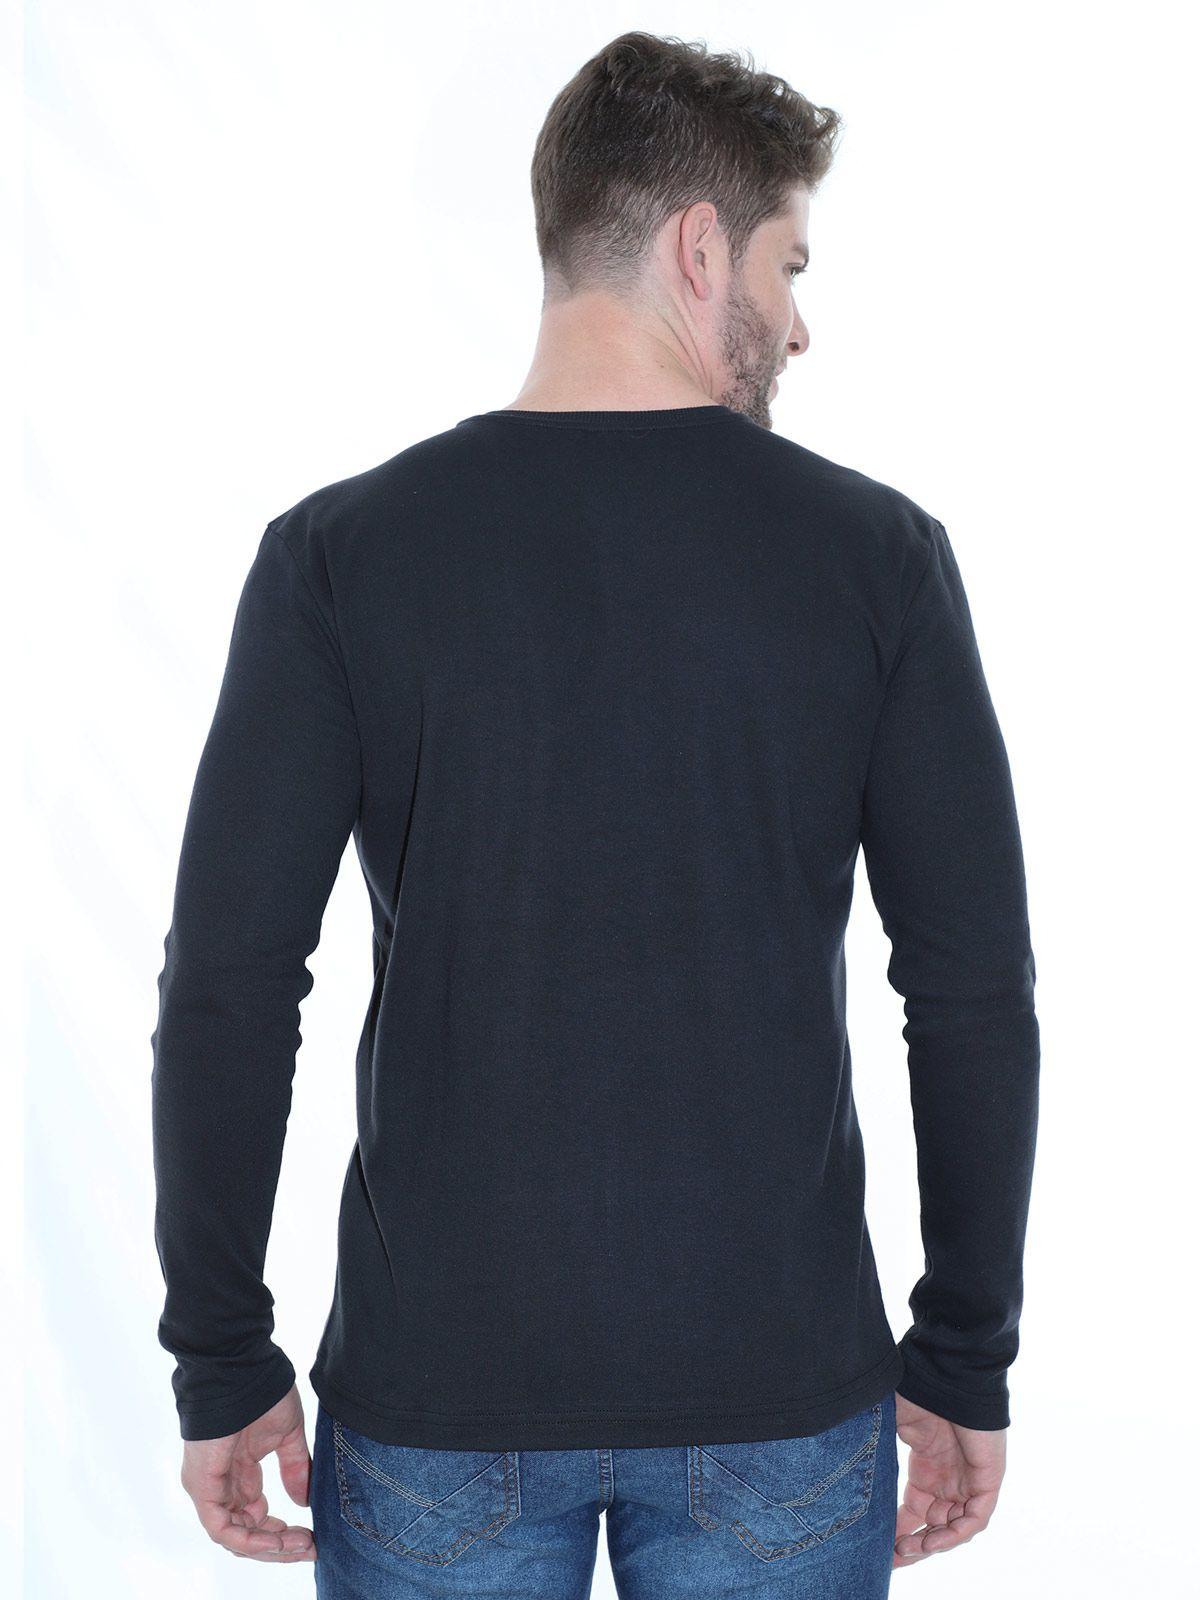 Blusa Masculina Anistia Manga Longa Decote V Estampada Preta